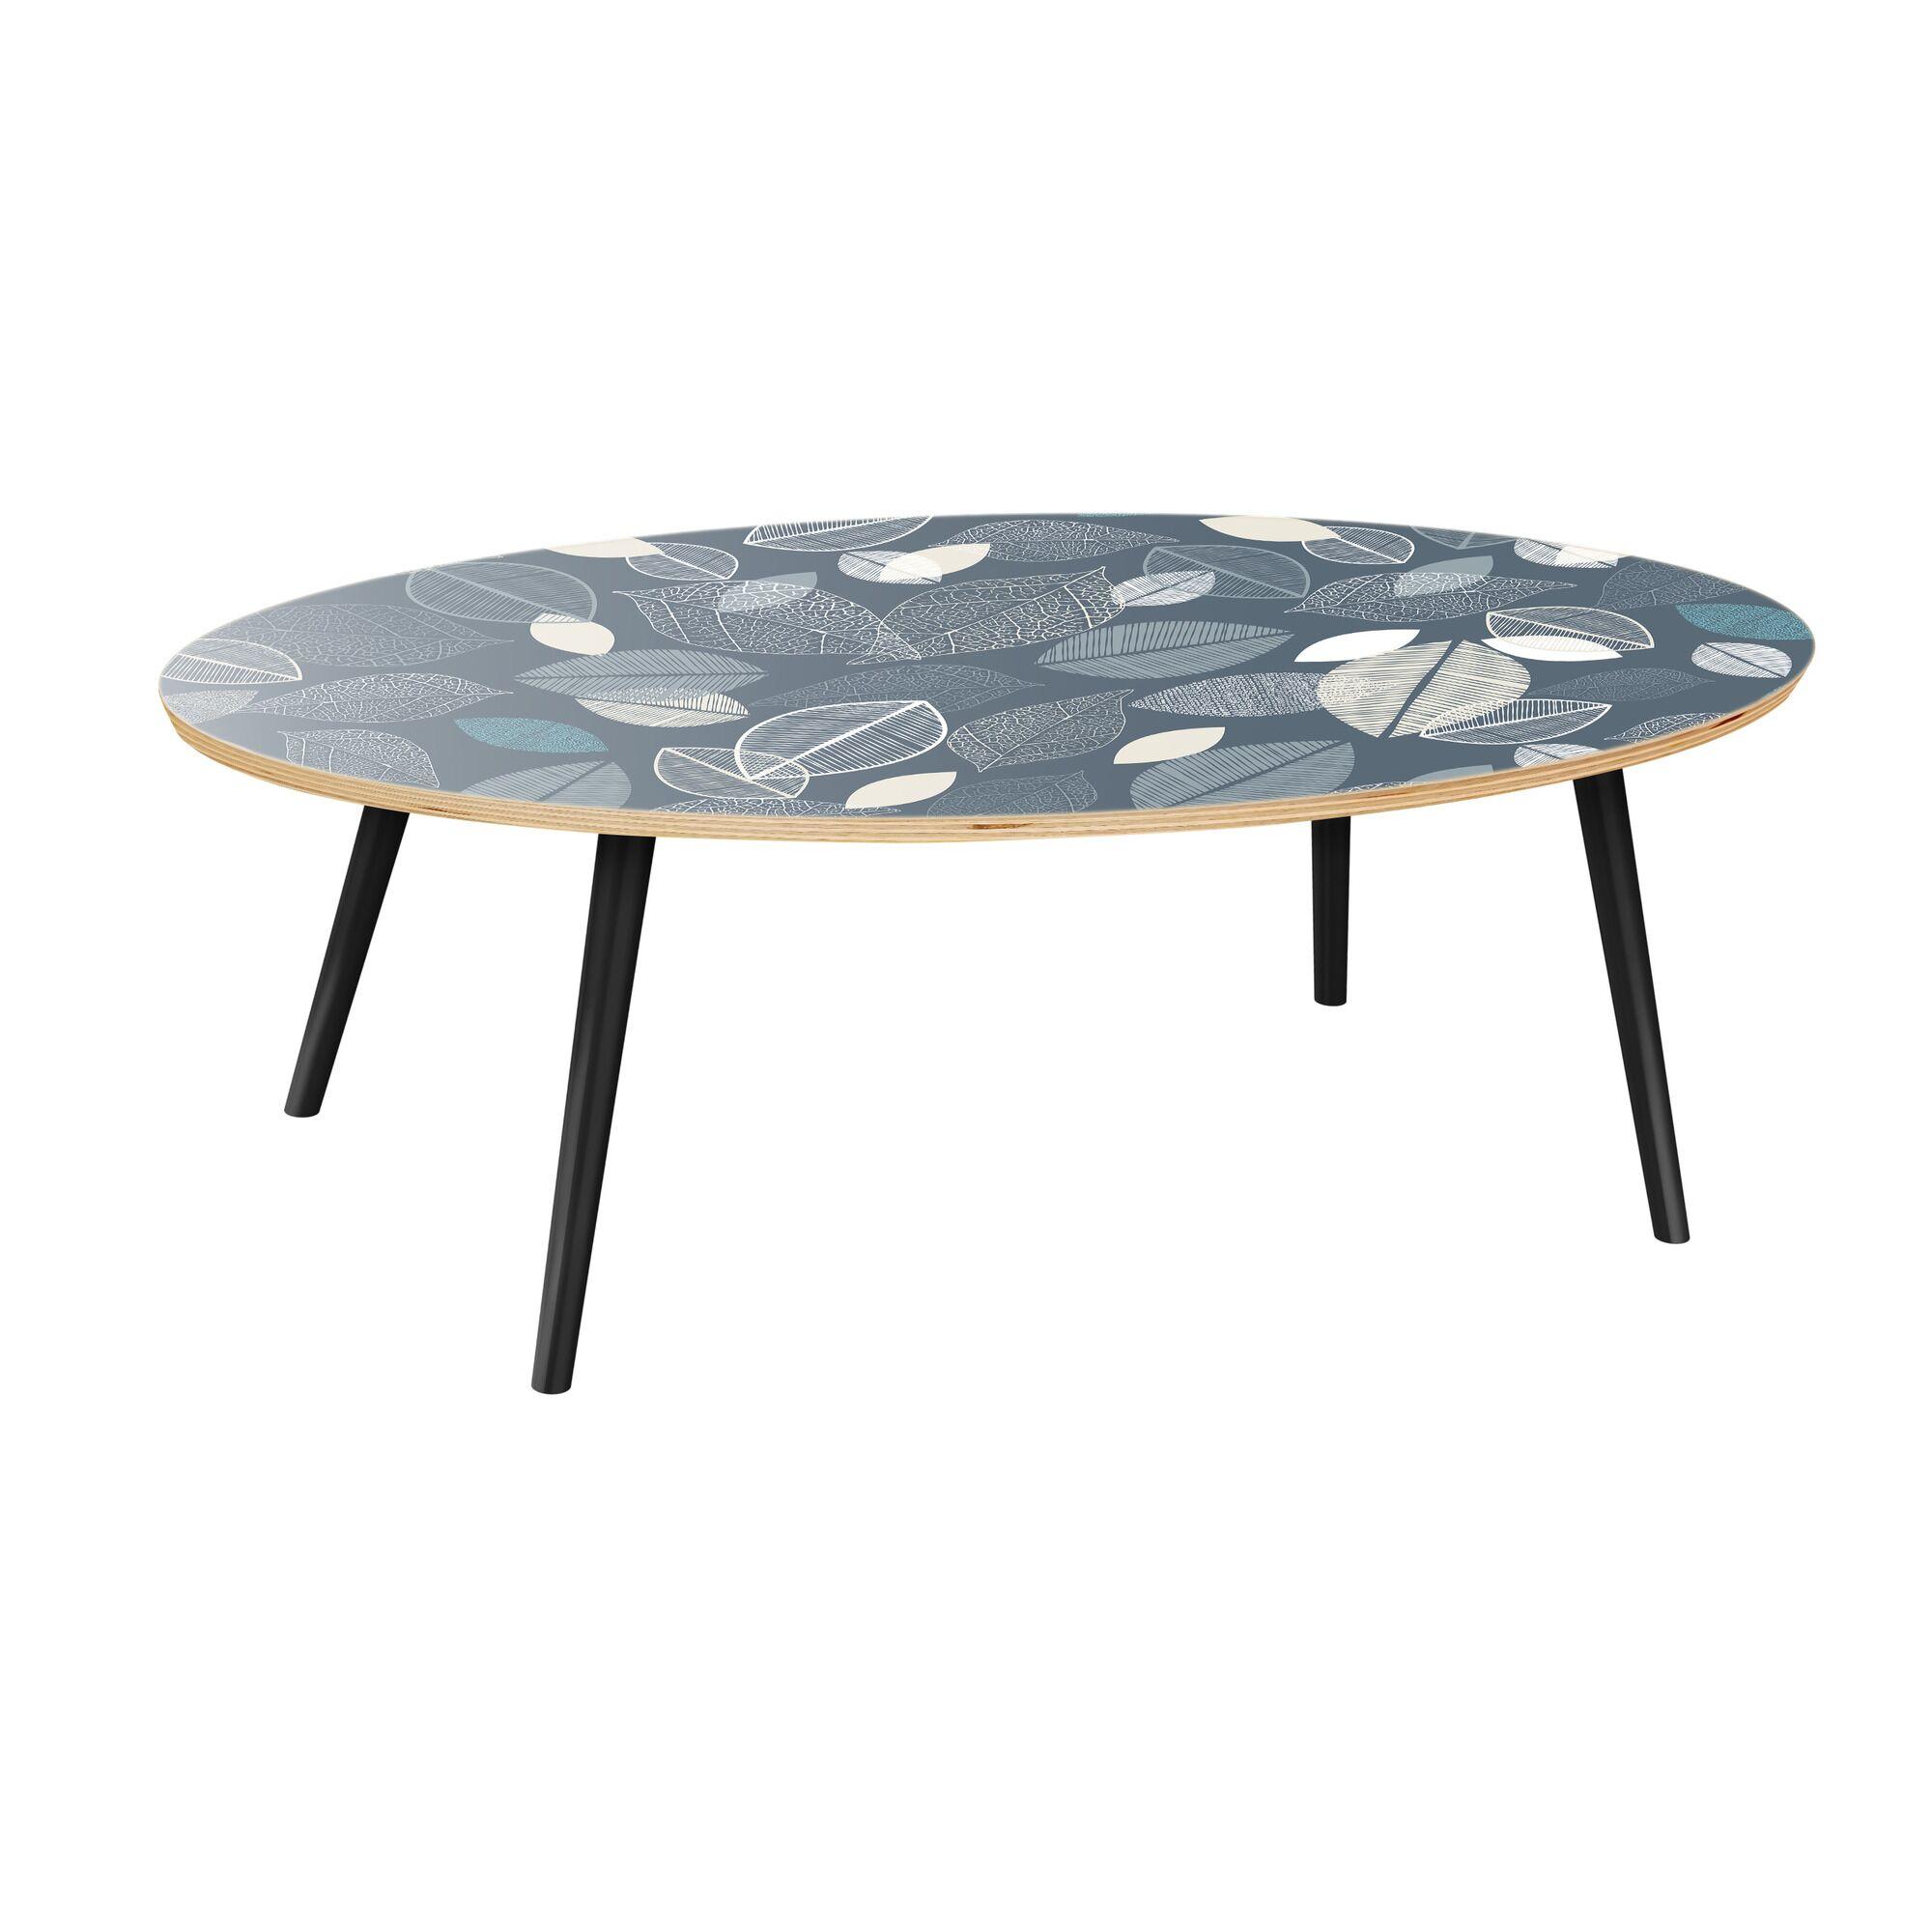 Kirstin Coffee Table Table Base Color: Black, Table Top Boarder Color: Walnut, Table Top Color: Blue